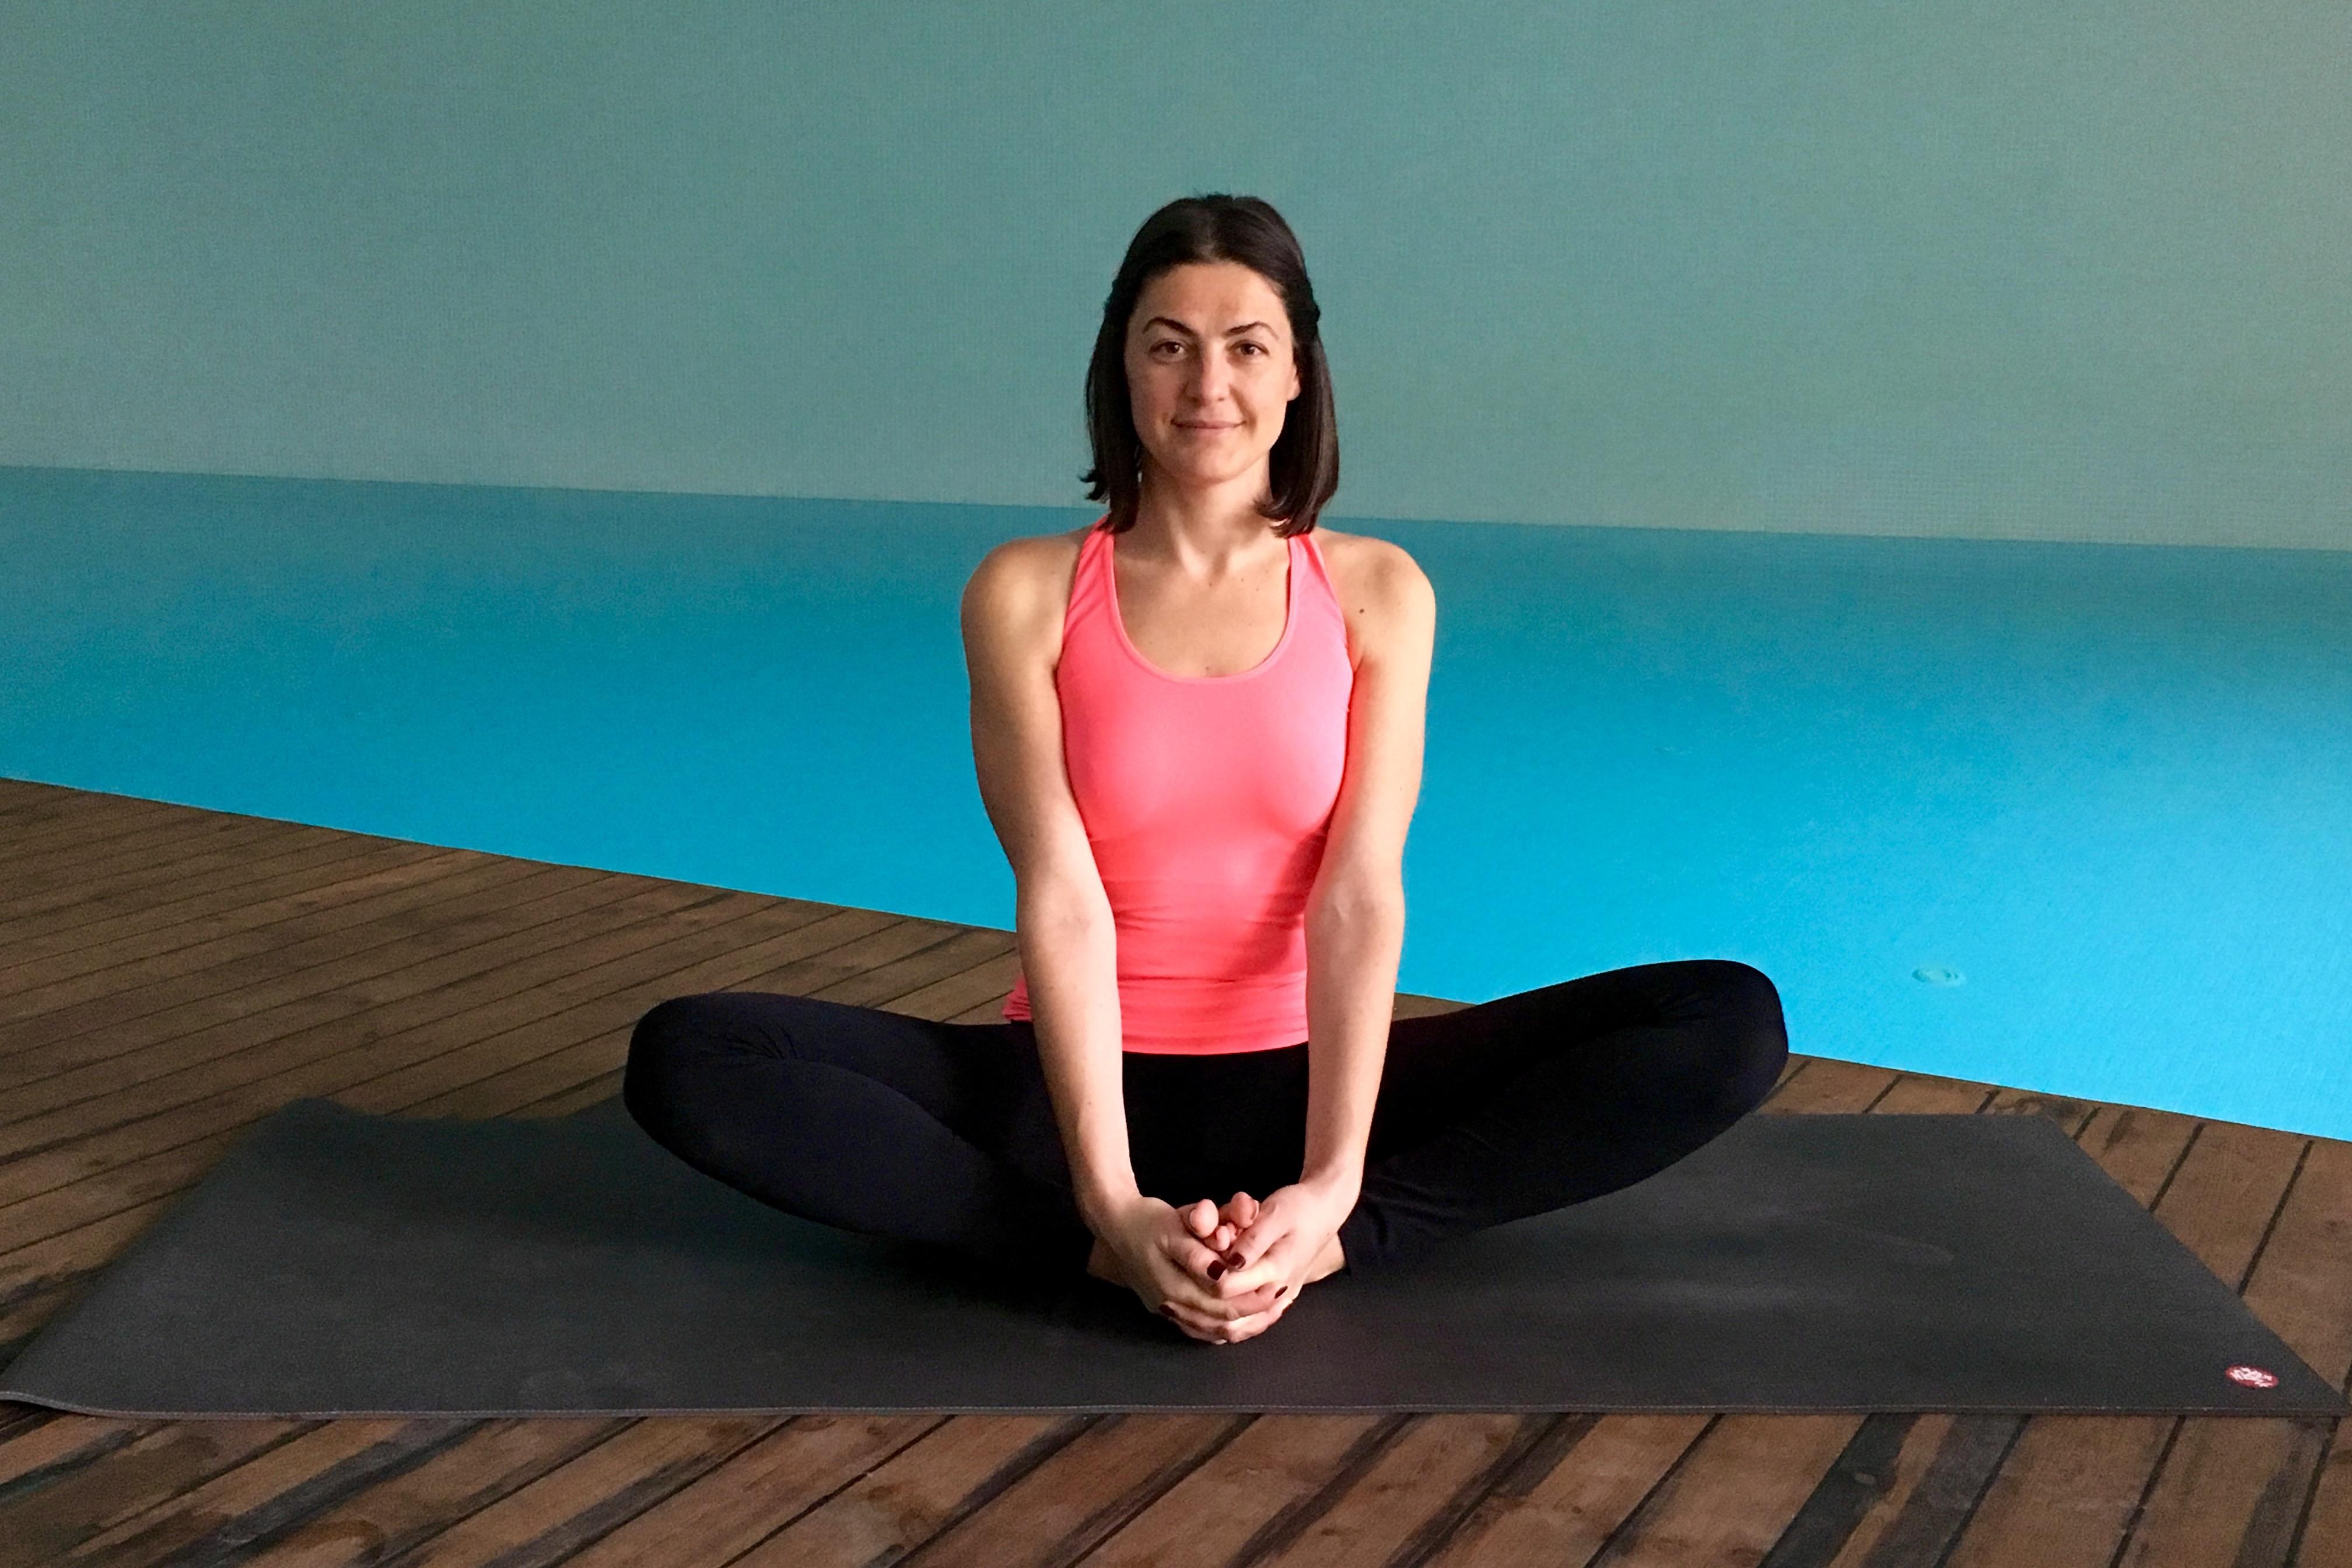 yin yoga - kelebek duruSu - baddha konasana